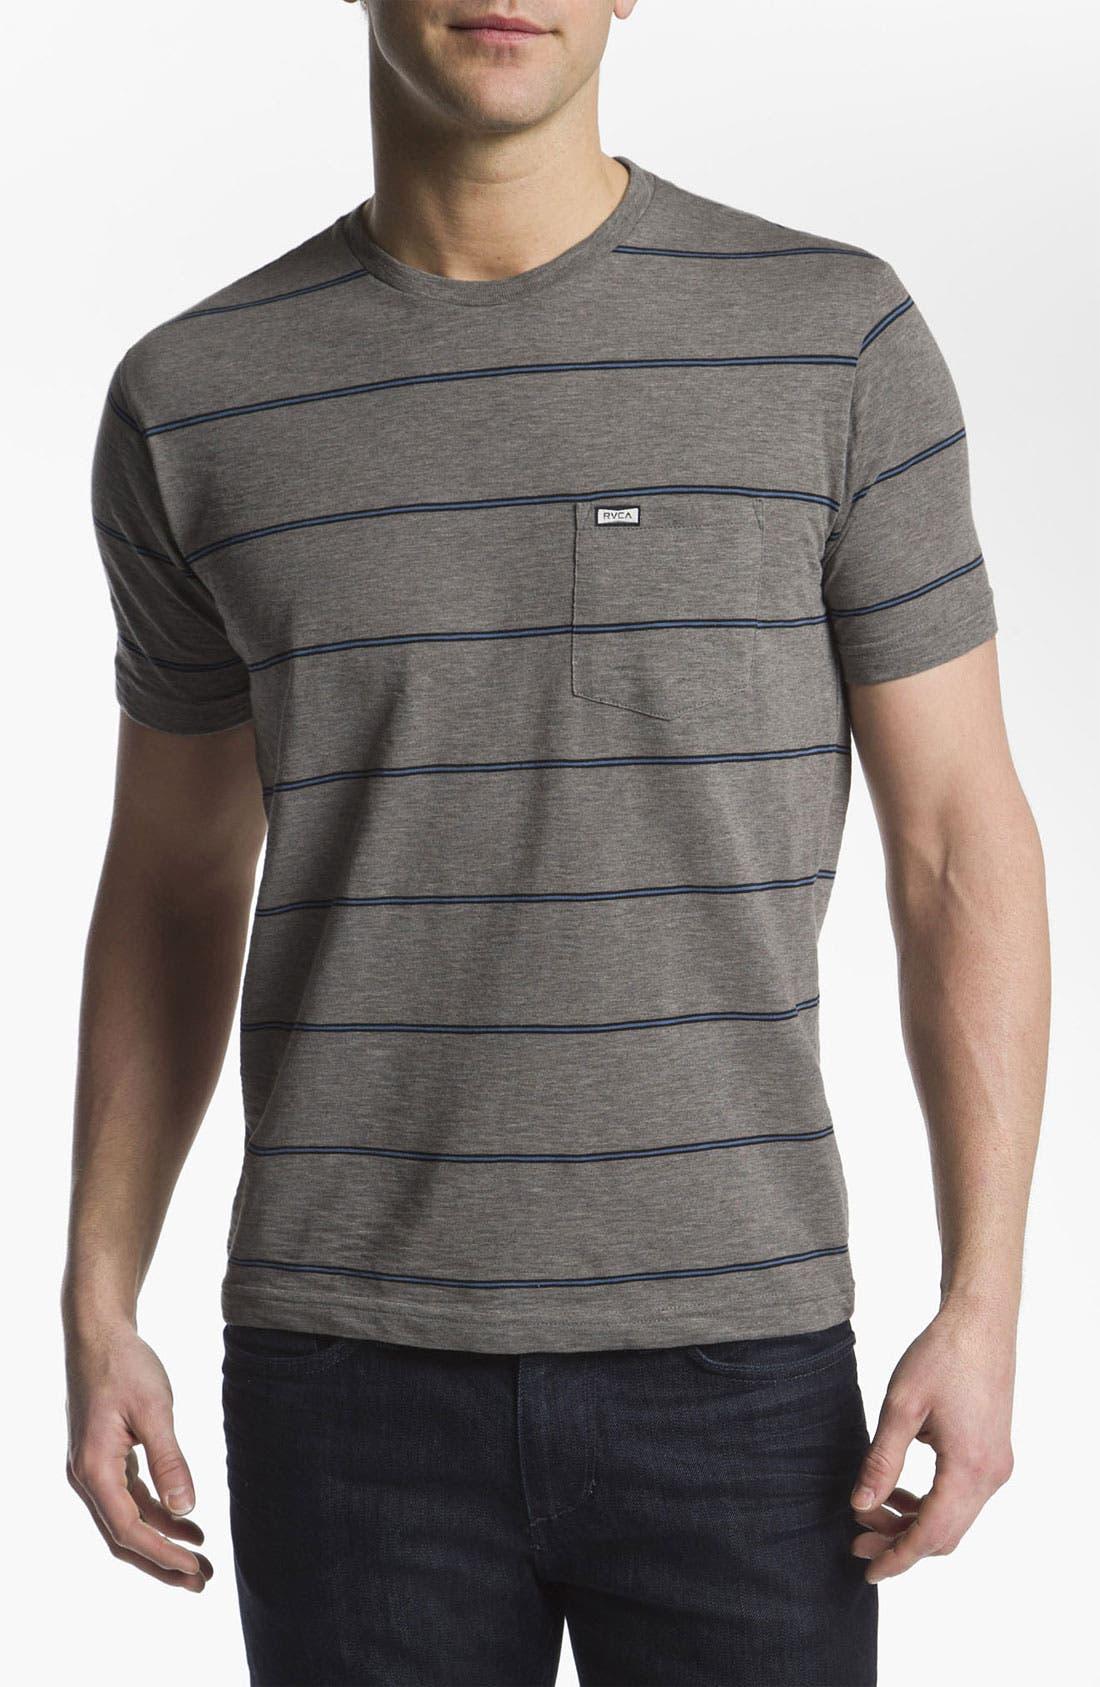 Main Image - RVCA 'Emmet' T-Shirt